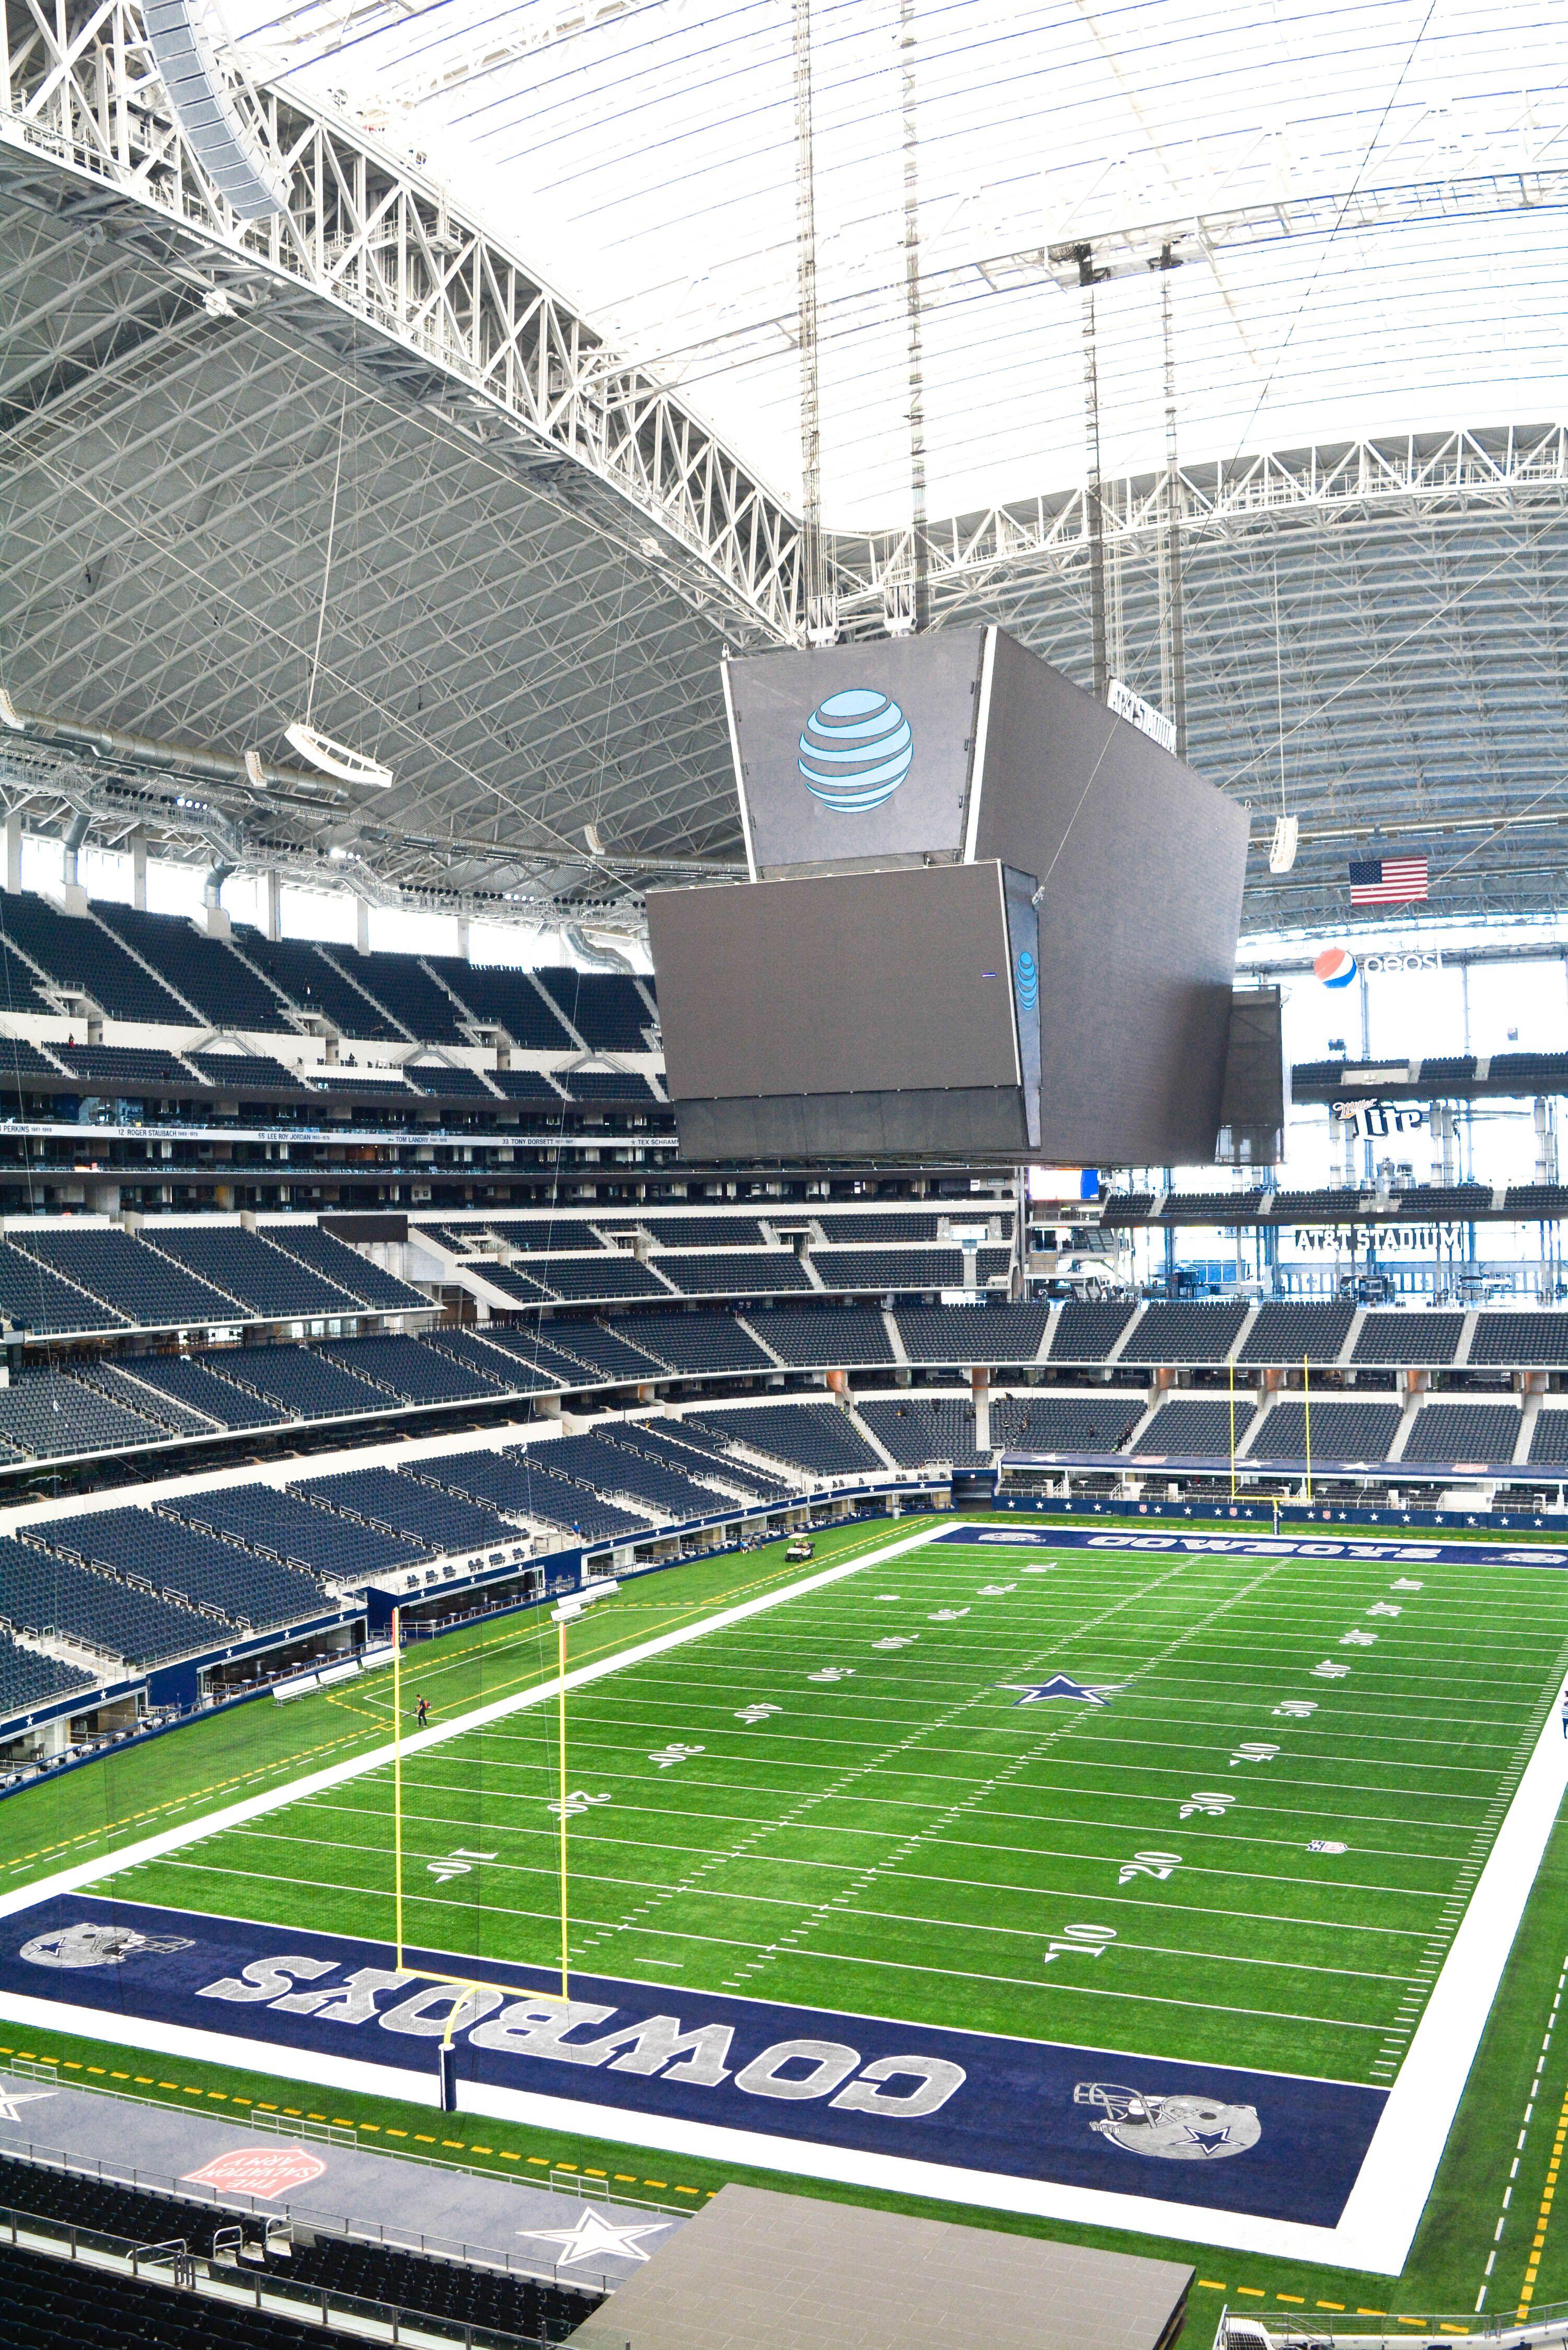 Inside At T Stadium Home Of The Dallas Cowboys In Arlington Texas Cowboys Stadium Dallas Cowboys Stadium Tour Nfl Football Stadium